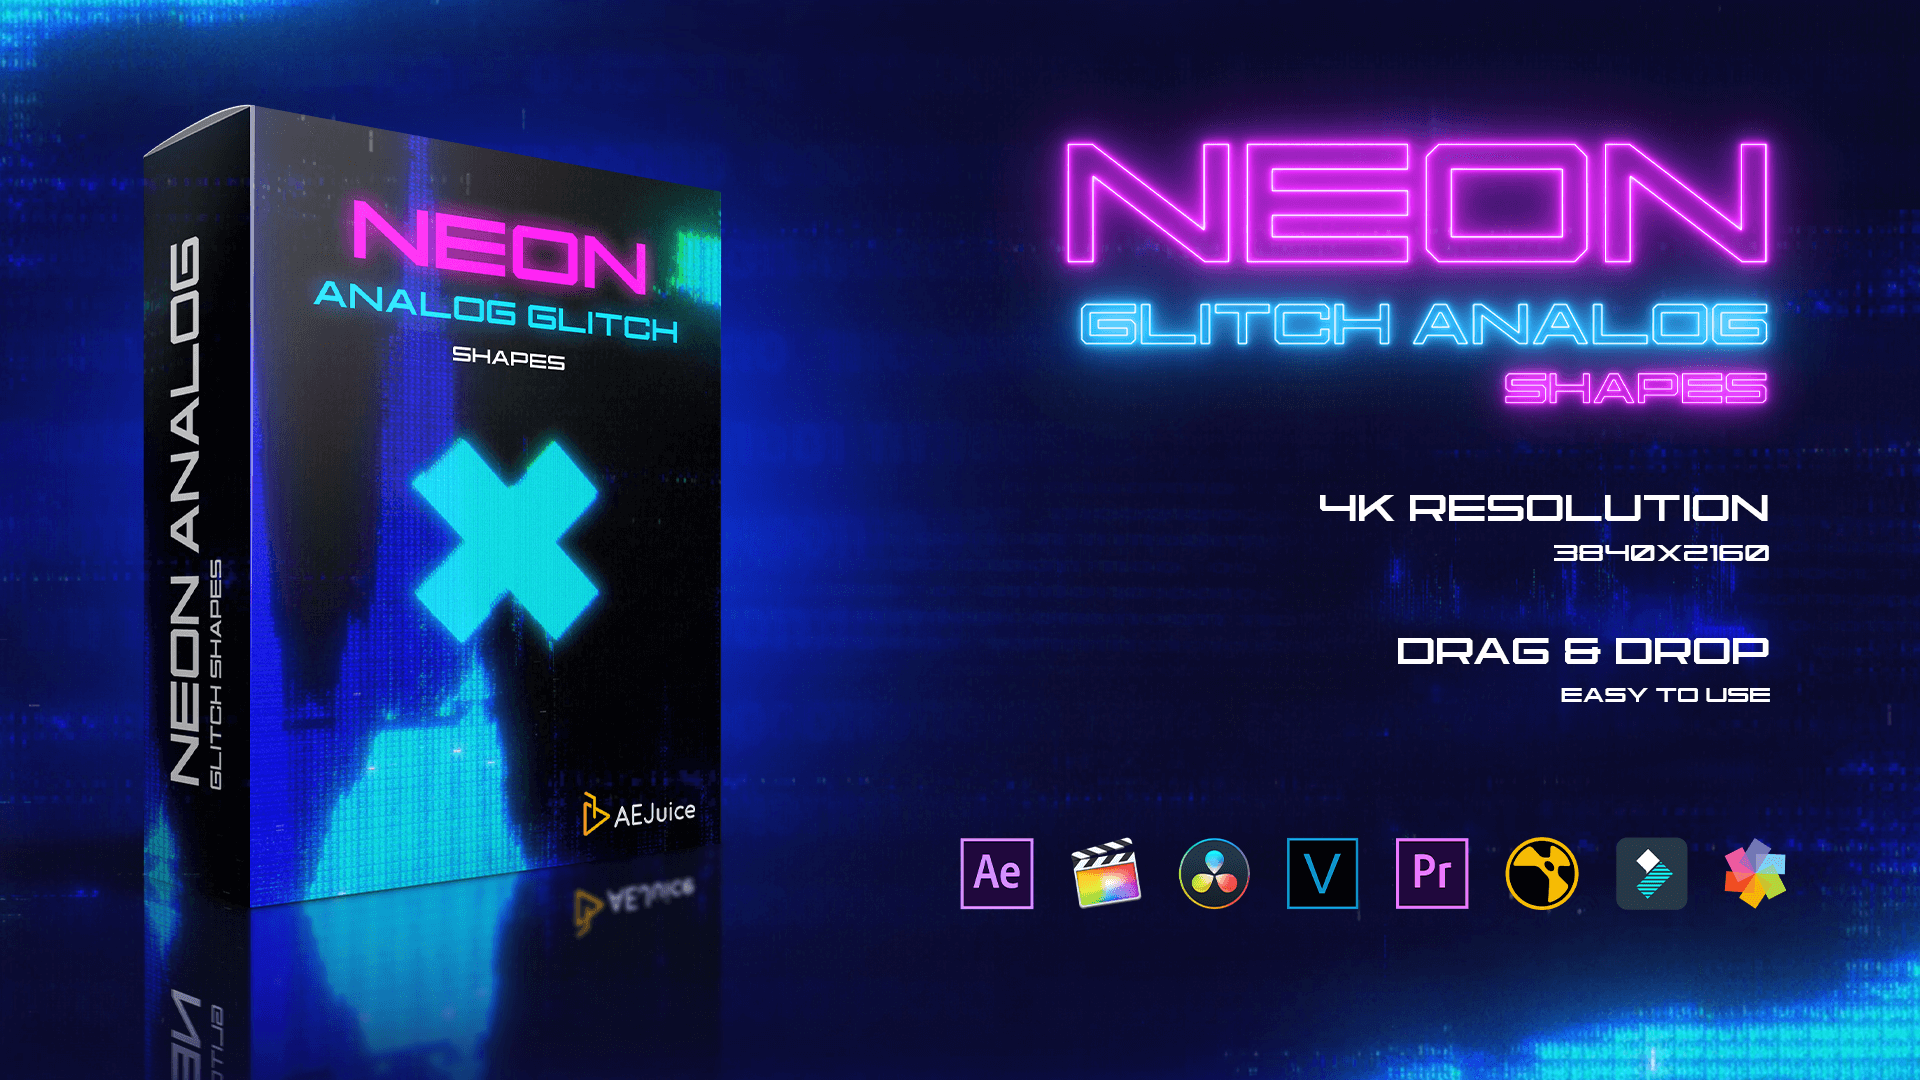 Neon Analog Glitch Shapes